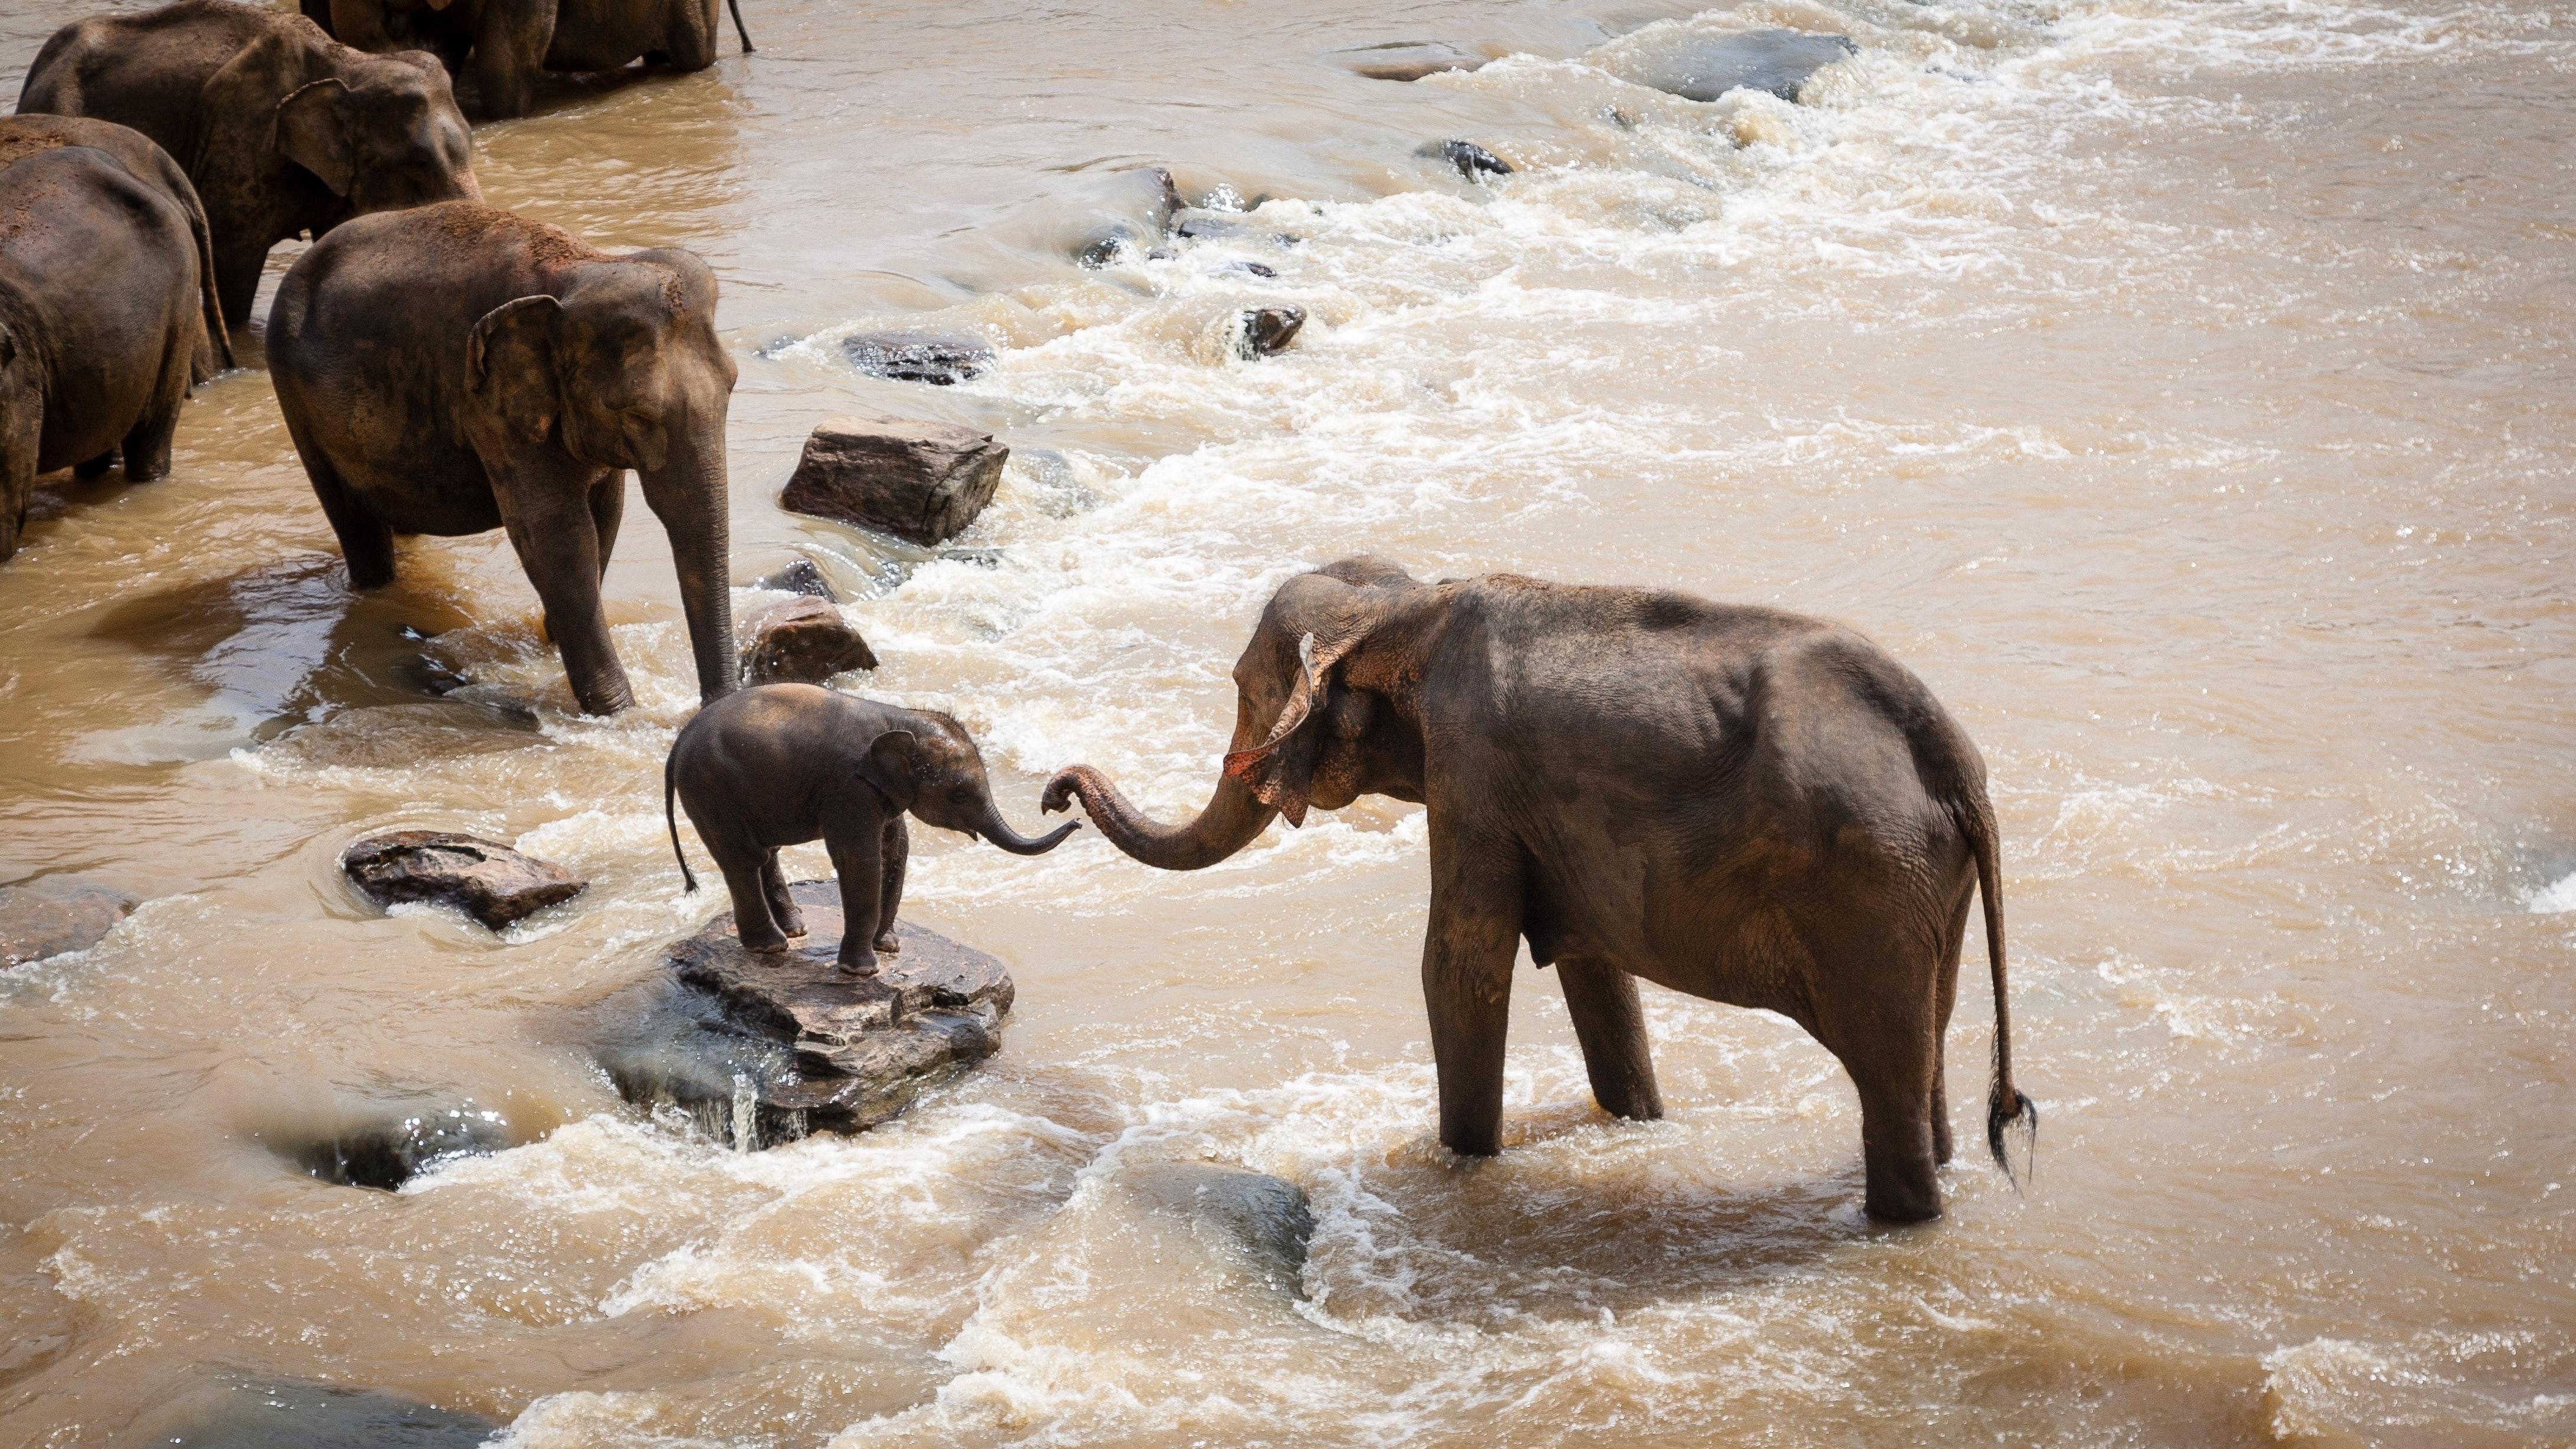 Elephants helping a baby elephant across a river